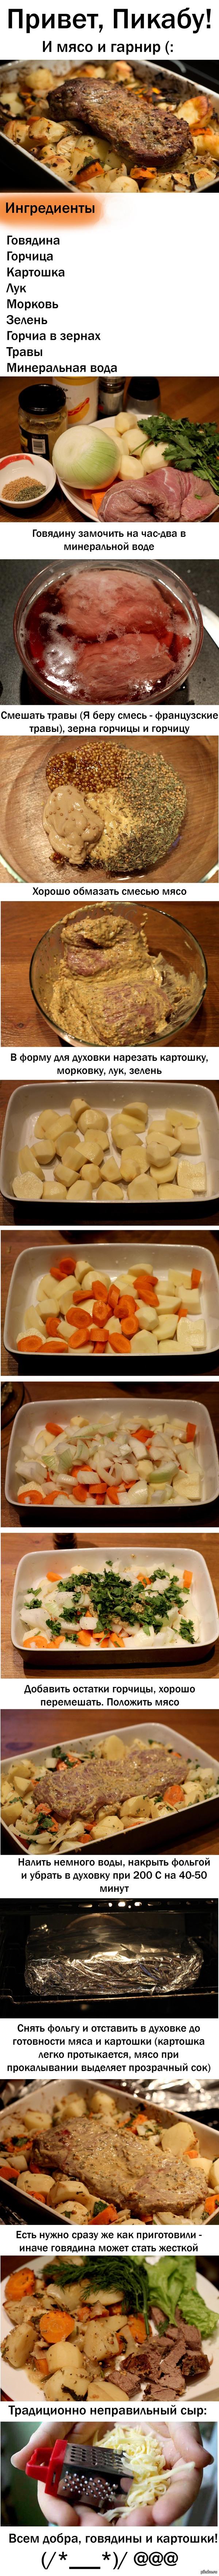 Говядина с картошкой в горчице Нужна духовка